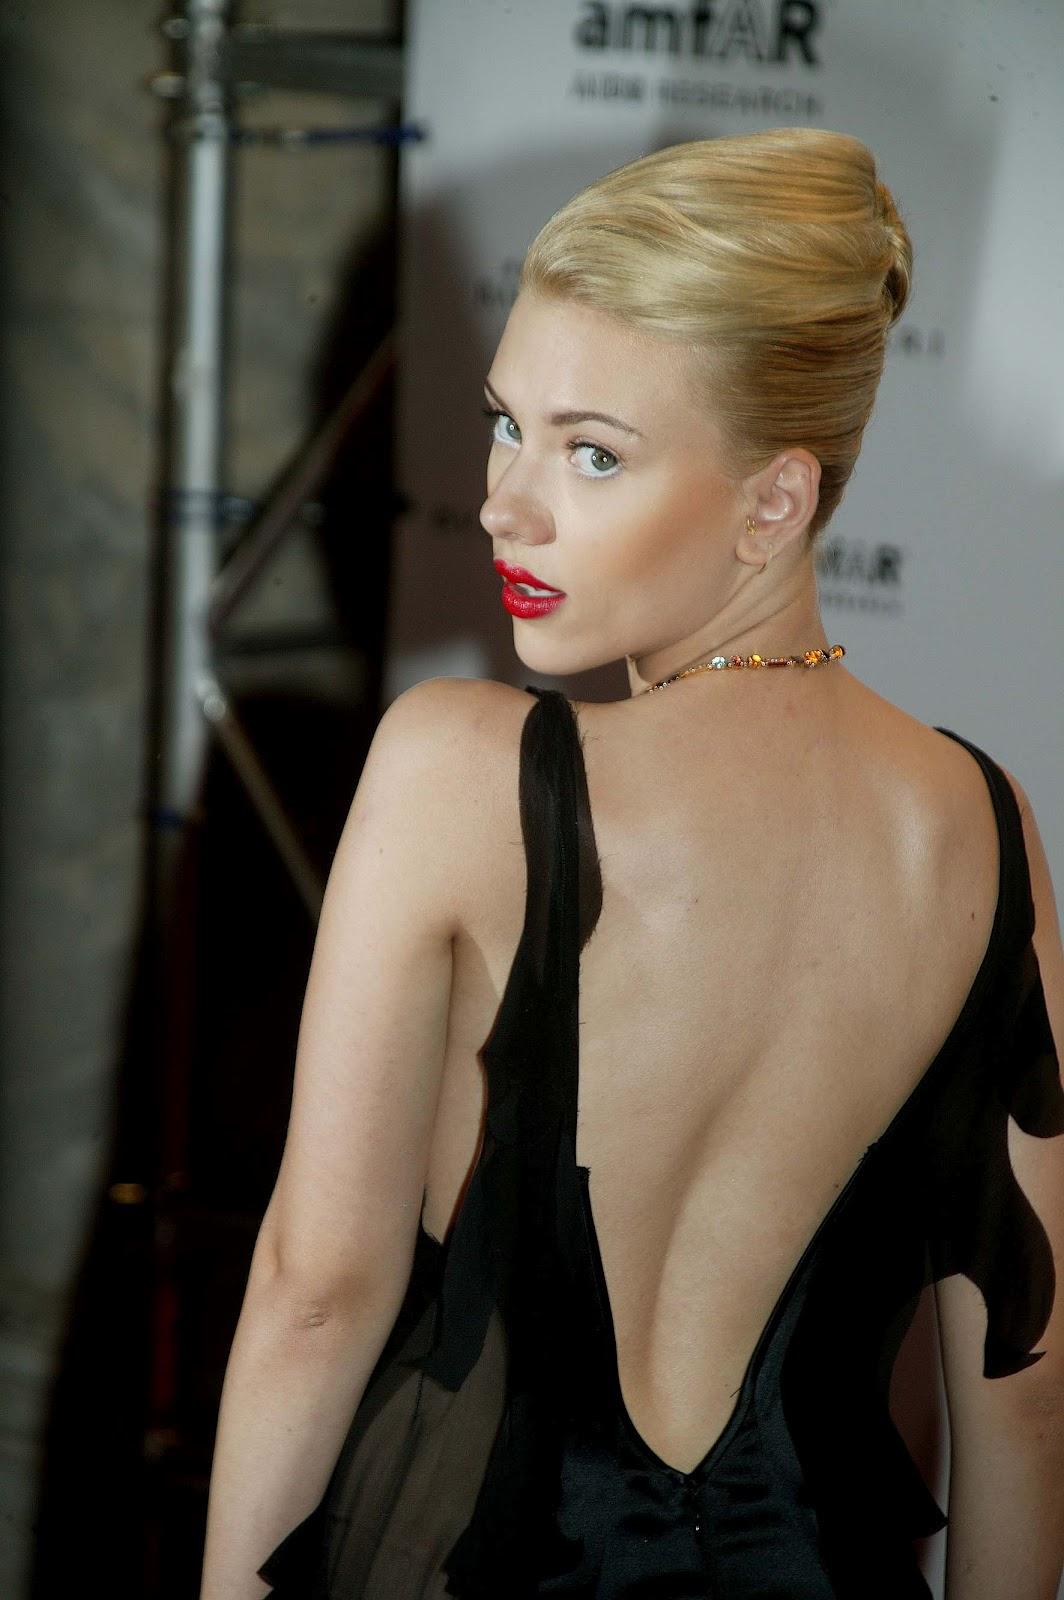 Scarlett johansson pictures gallery 37 film actresses - Scarlett johansson blogspot ...